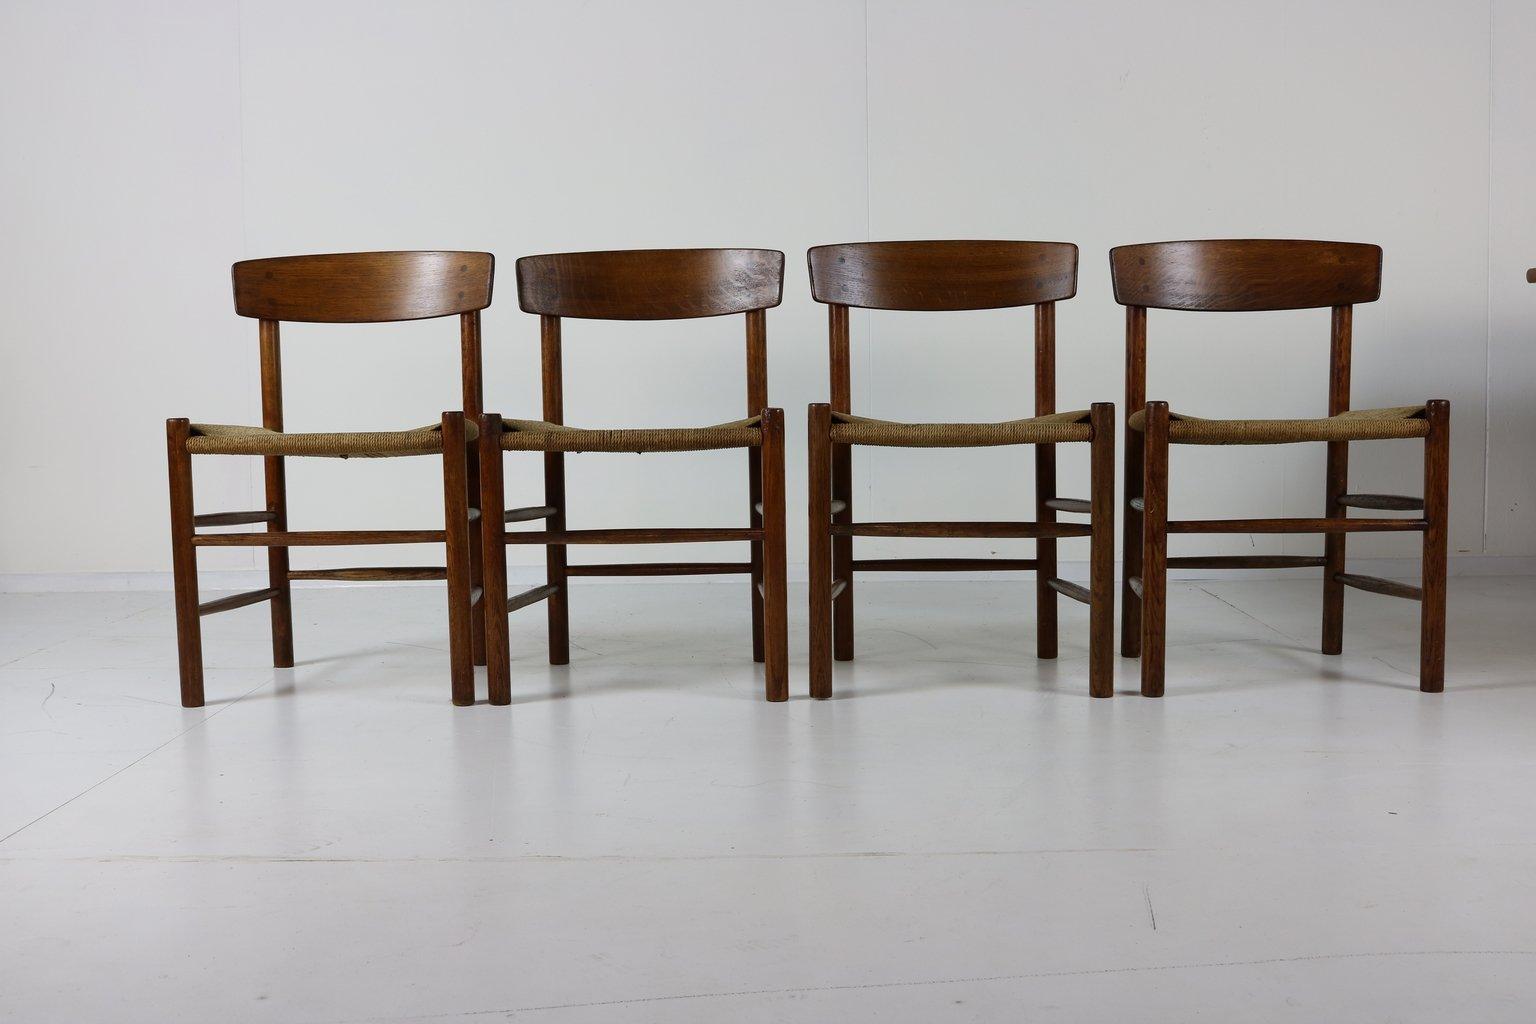 Shaker J39 Dinner Chairs By Børge Mogensen For FDB, 1959